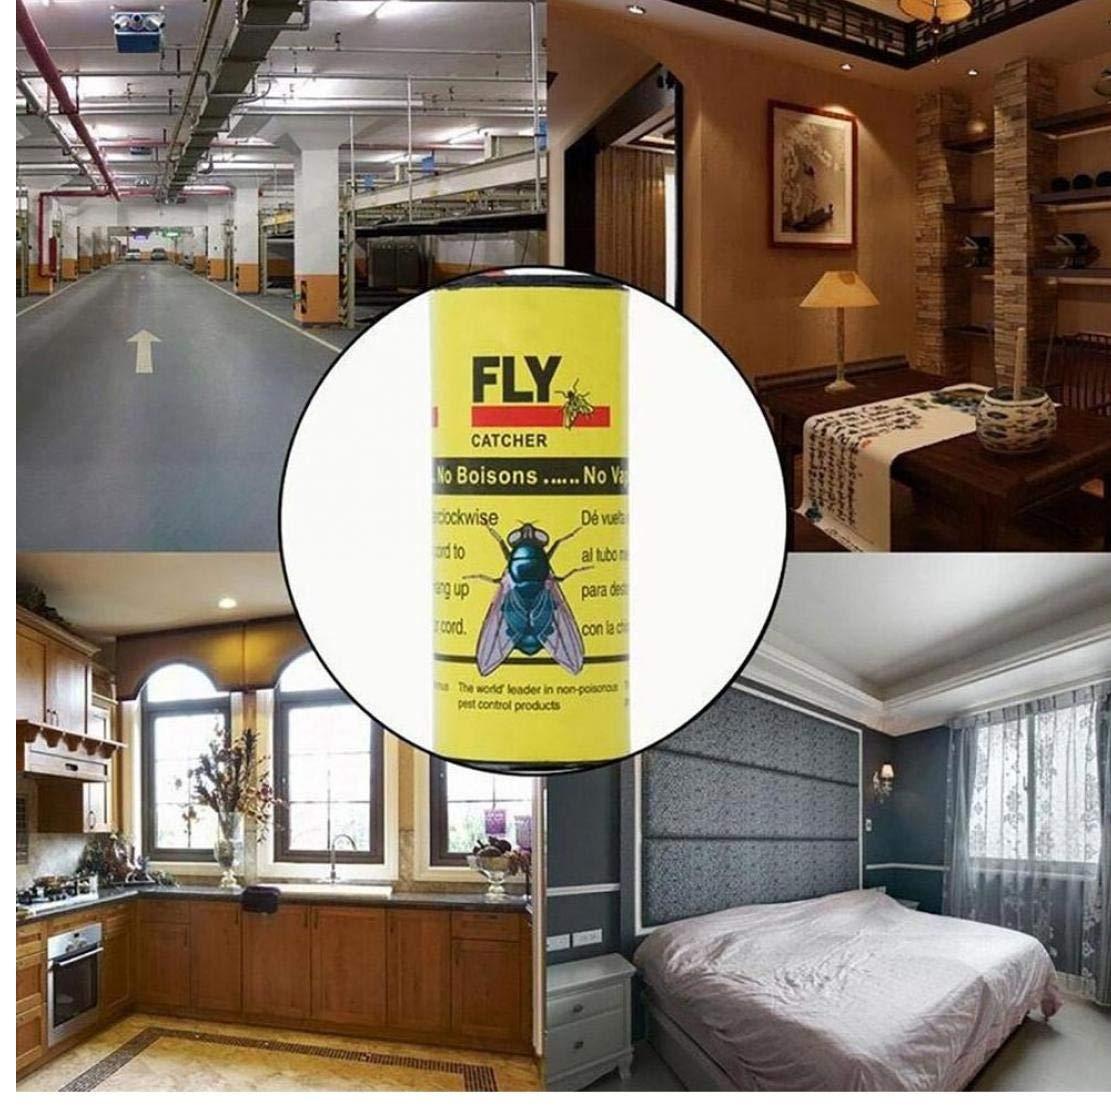 4rolls Fly Papel pegajoso Strip Mosquitos Killer Fly Catcher Trampa 4PC Papel Pest Control 1 de la Cinta de Tira